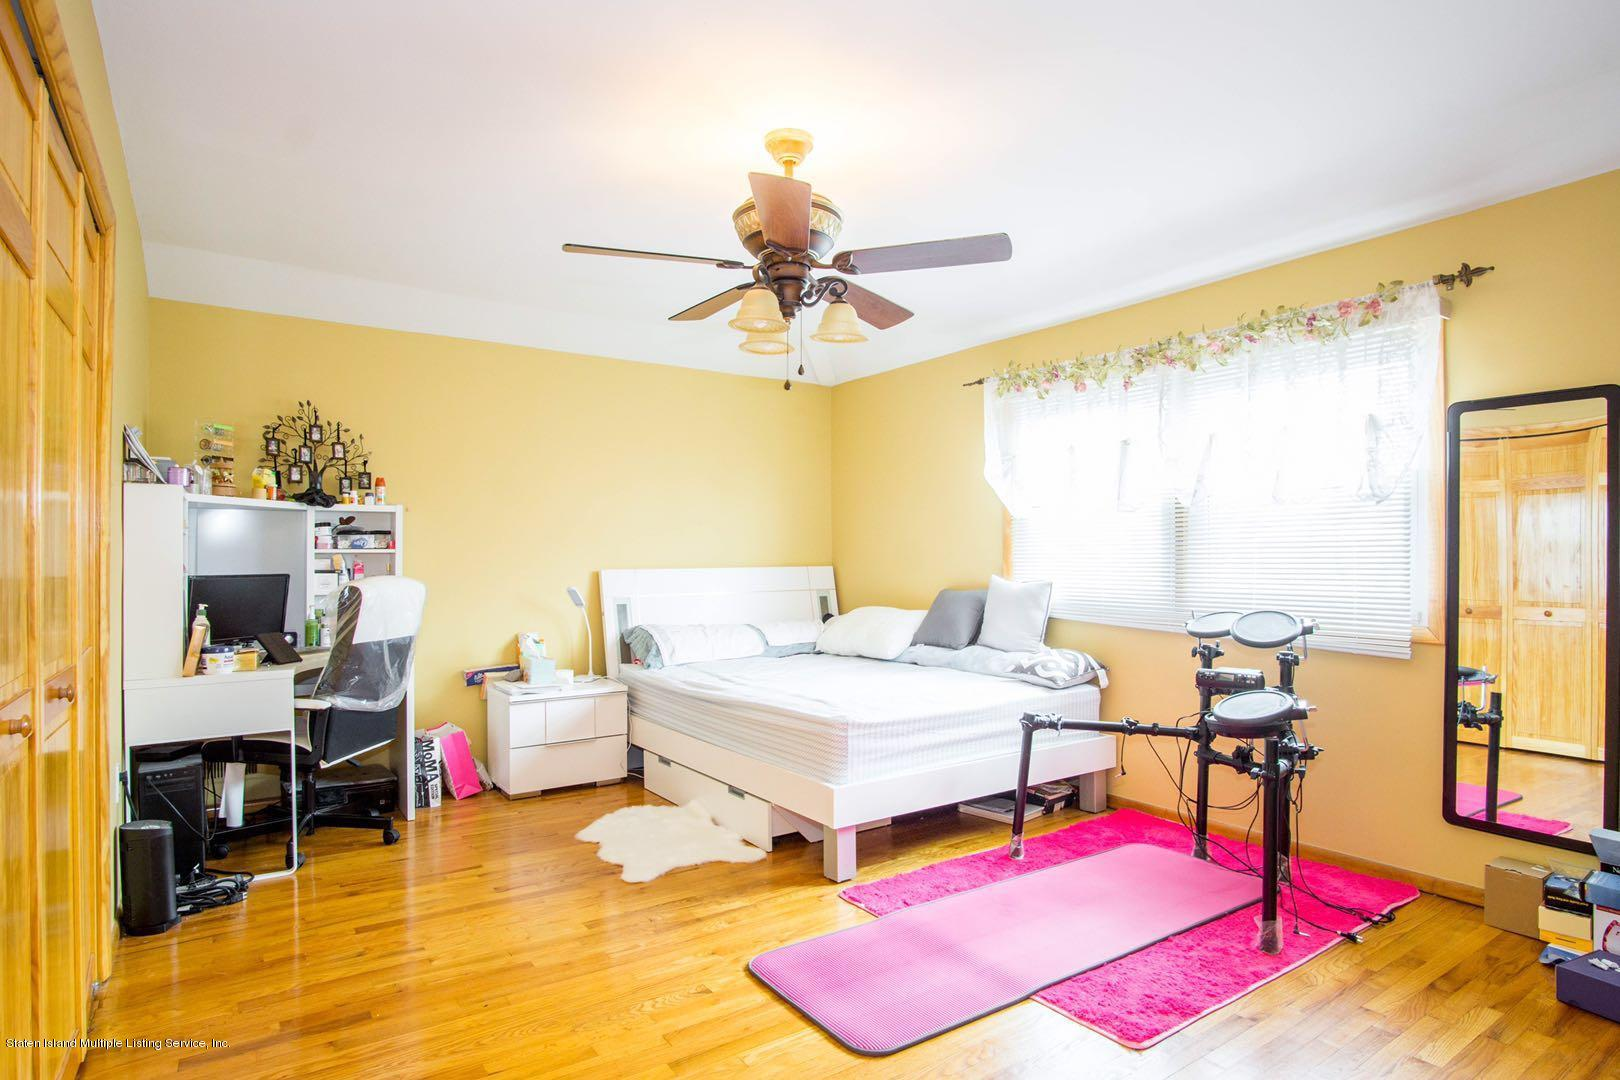 Single Family - Semi-Attached 202 Kirshon Avenue  Staten Island, NY 10314, MLS-1124892-6